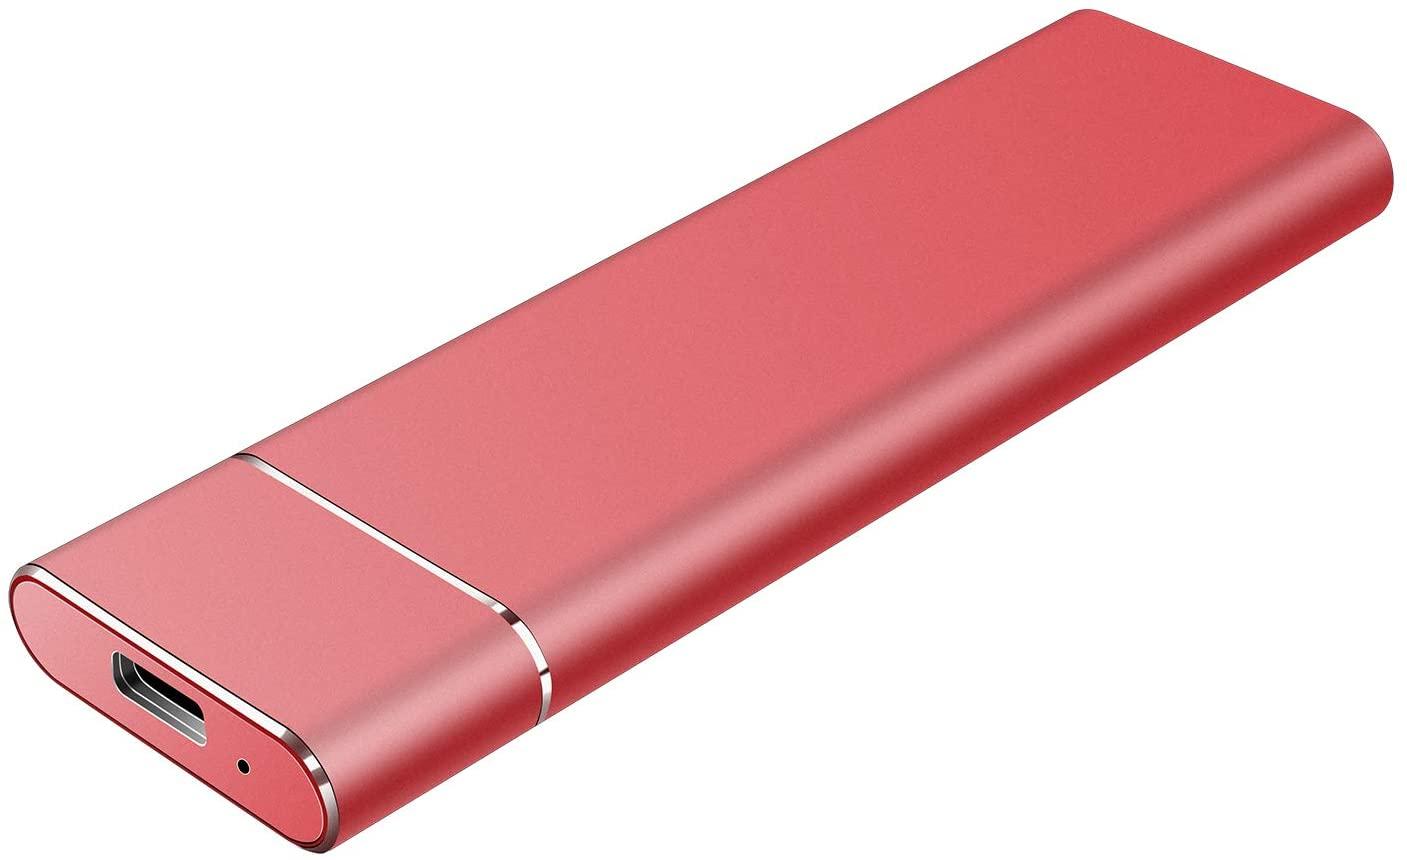 External Hard Drive 1TB - Ultra Slim Portable Hard Drive External Hard Drive for Mac,PC,Desktop,Laptop - Red,1TB